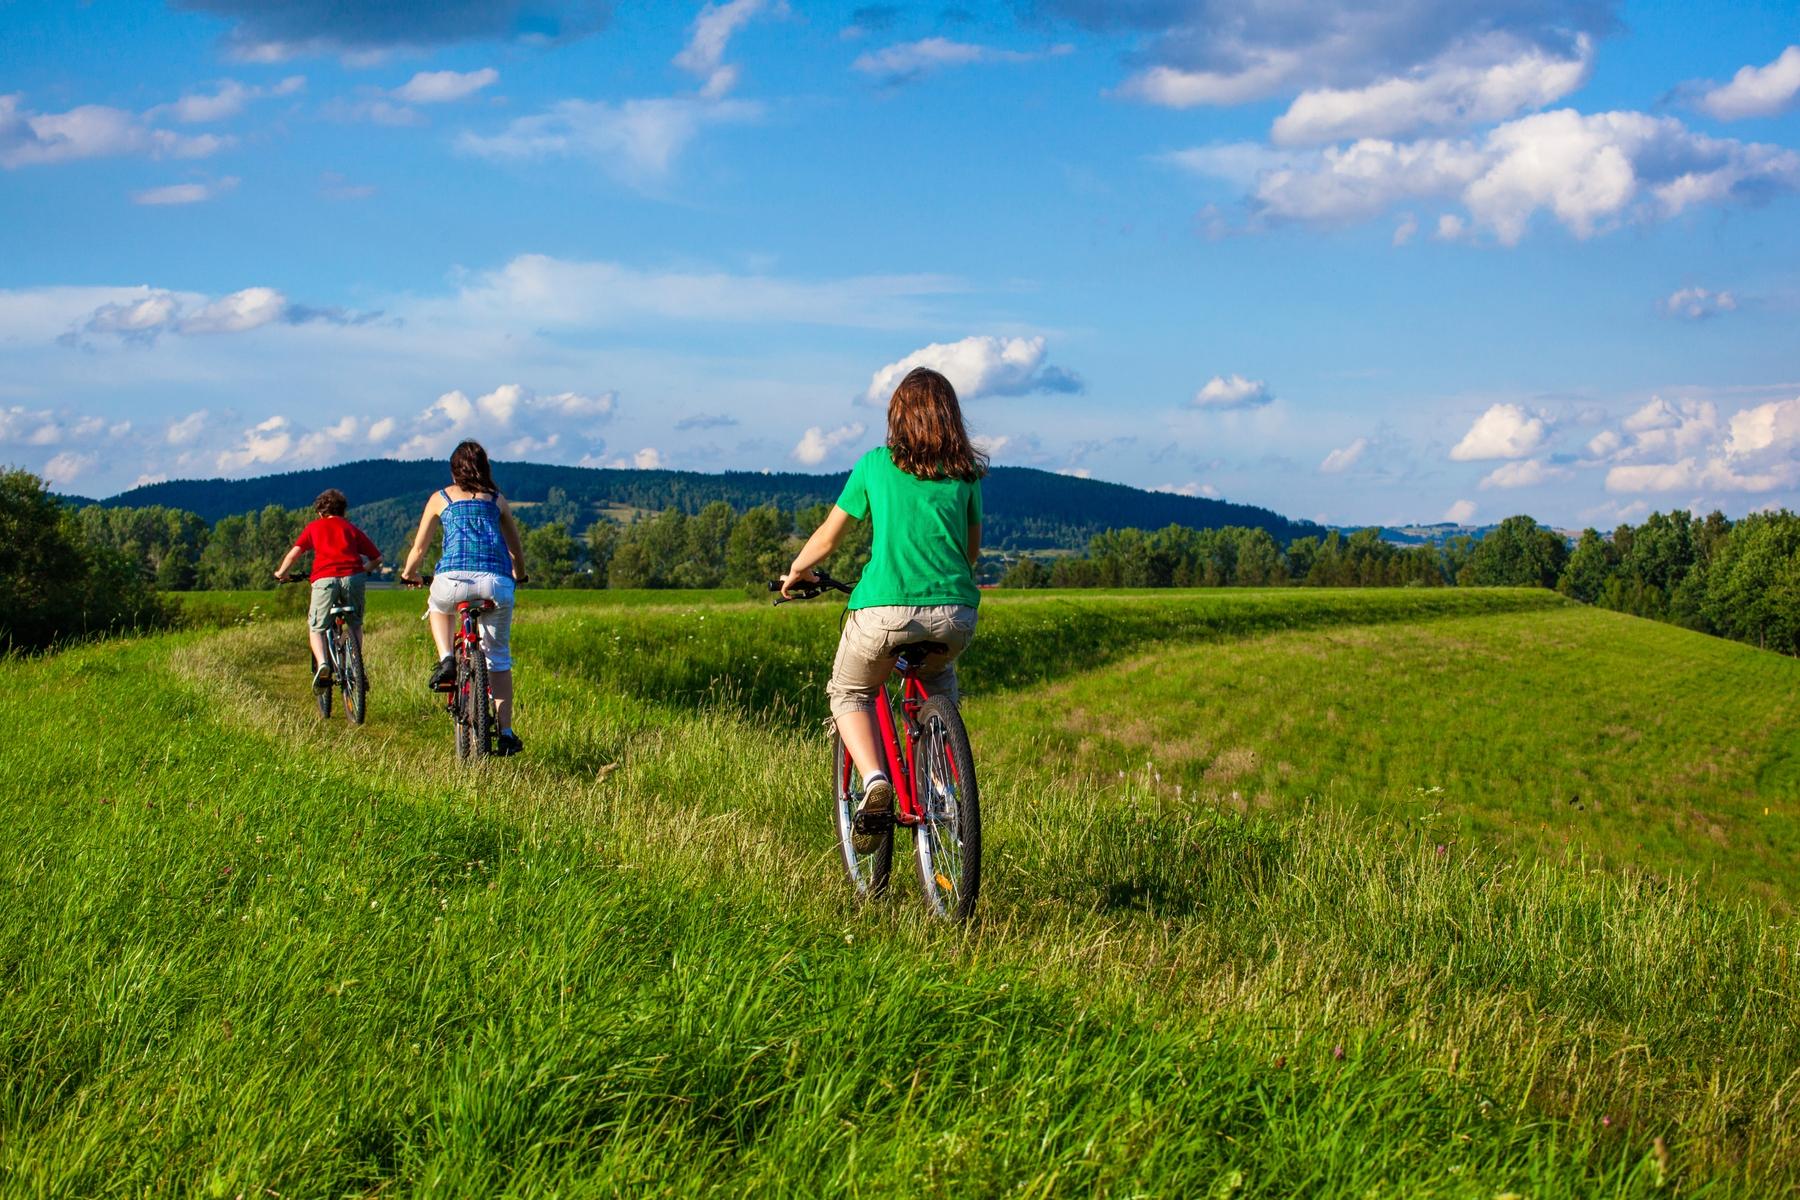 Three children riding their bikes through a grassy field.